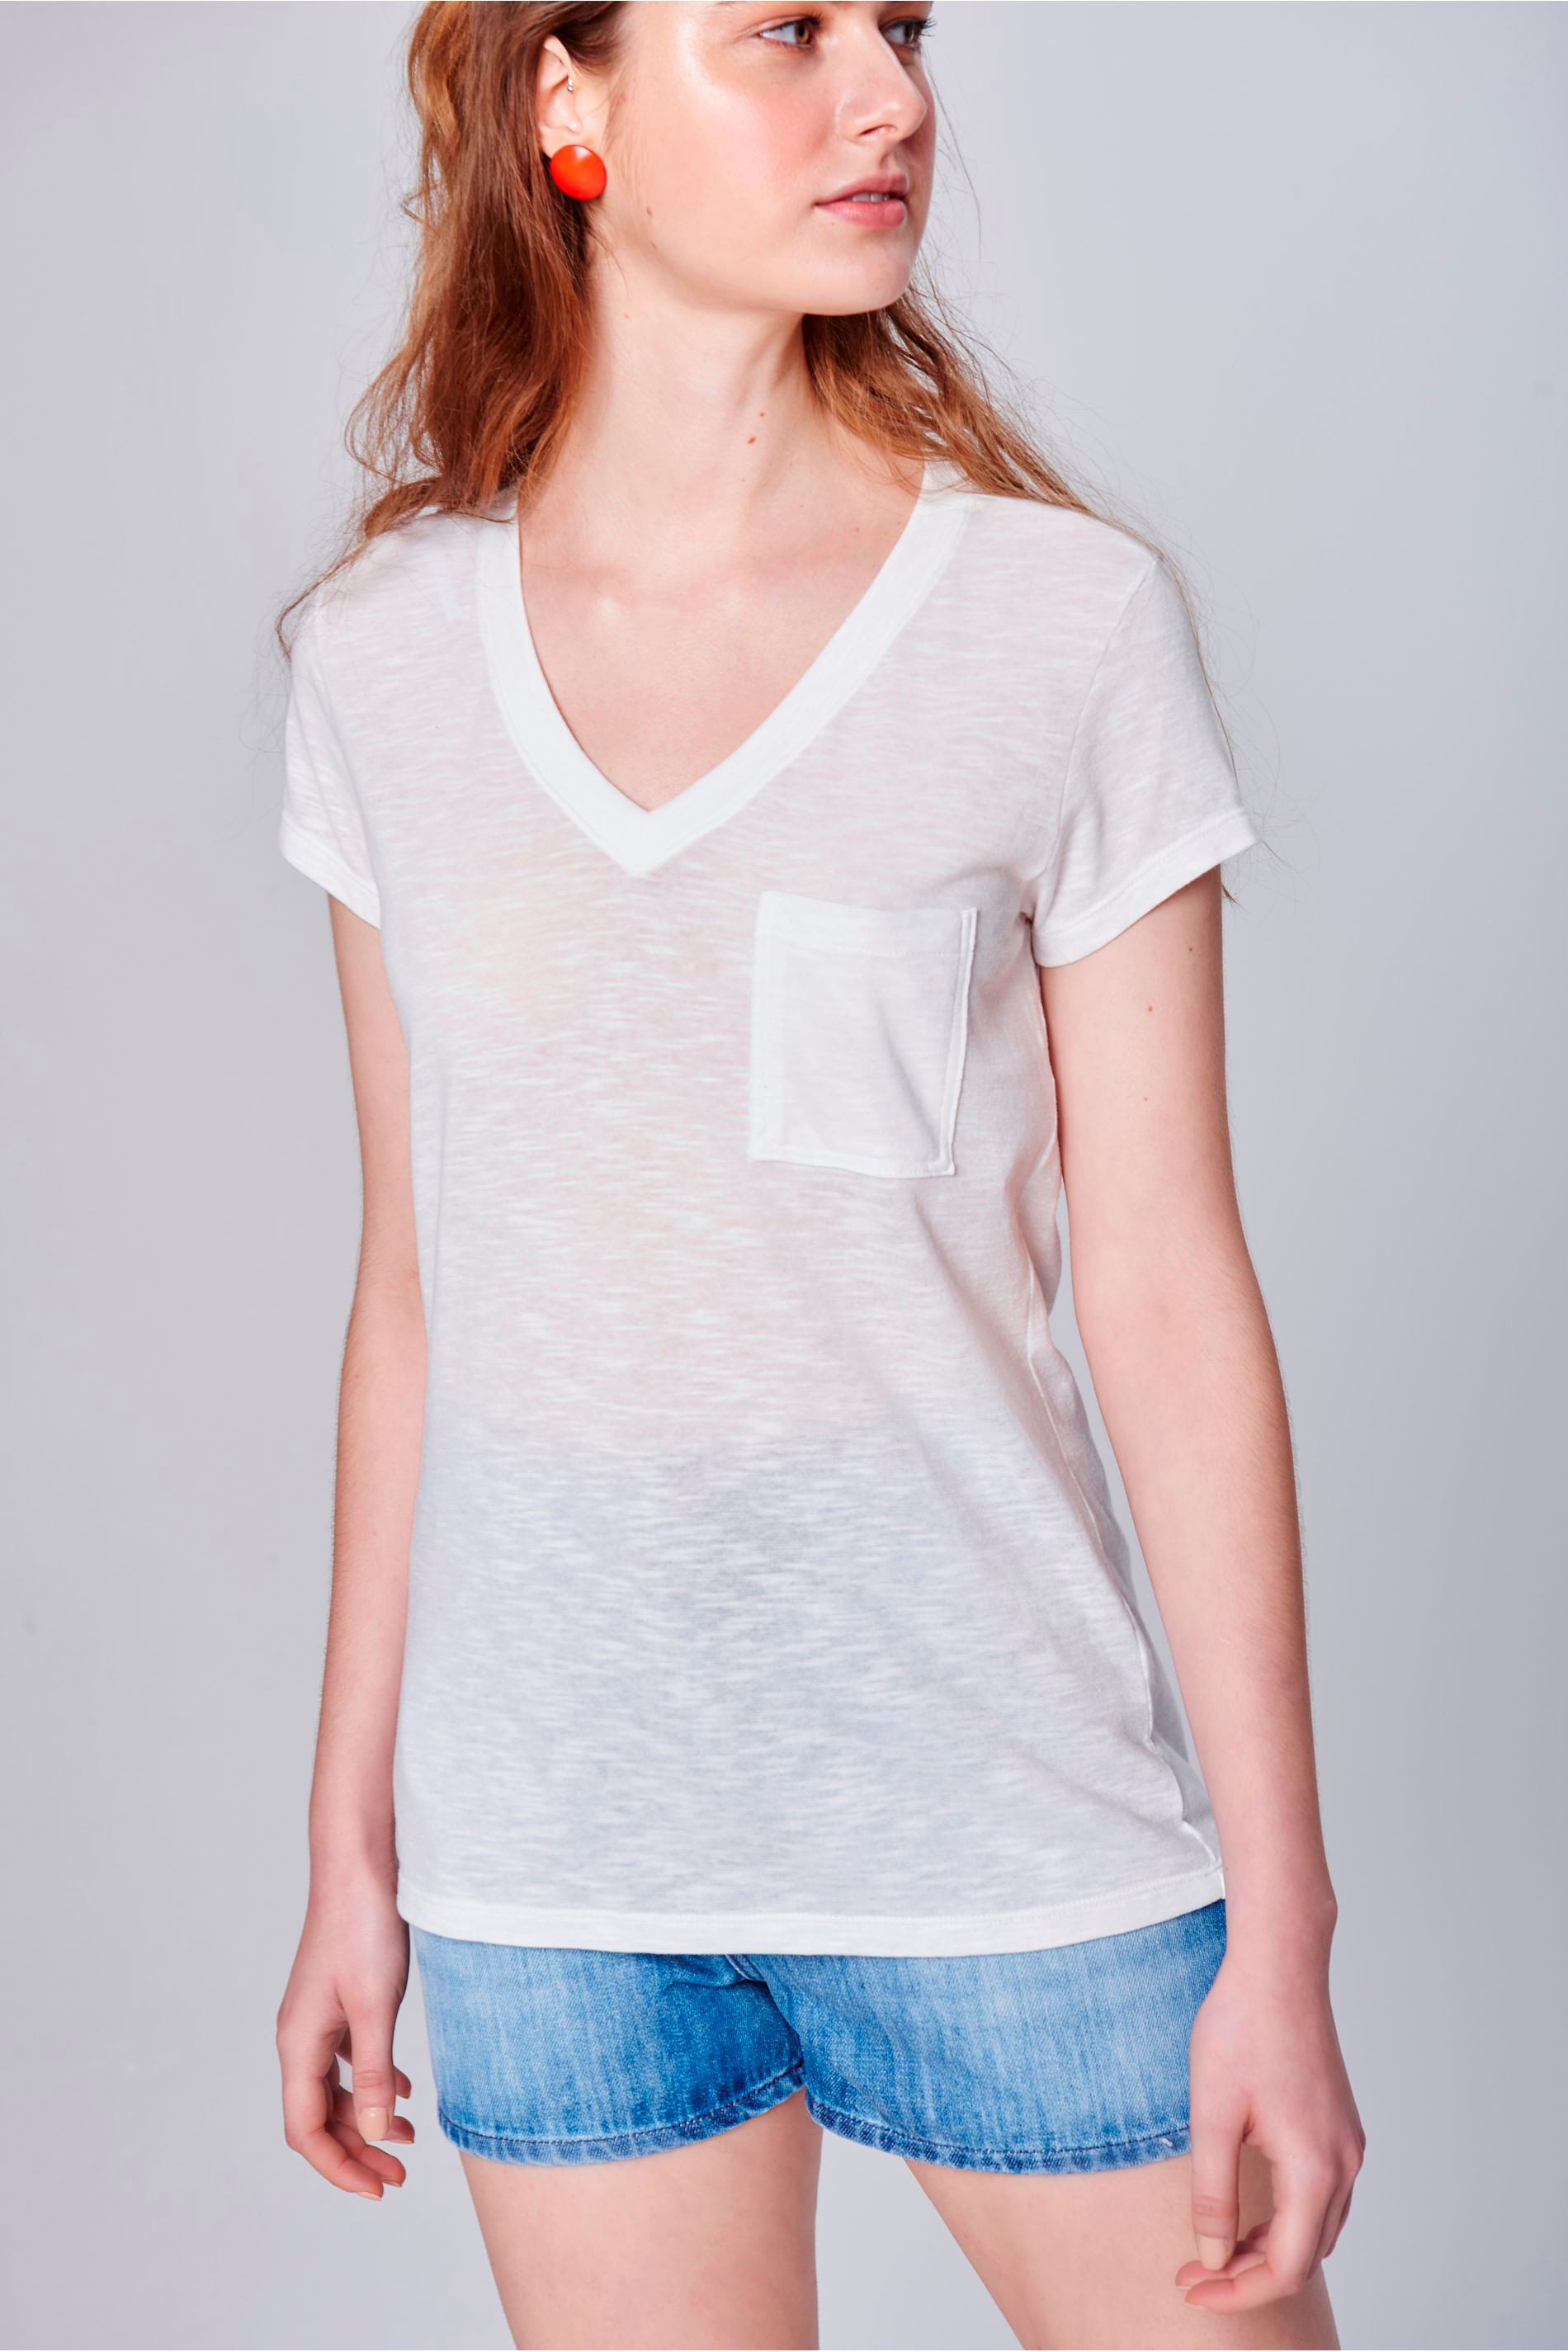 Camiseta Feminina Branca com Bolso - Damyller e417934fa7736